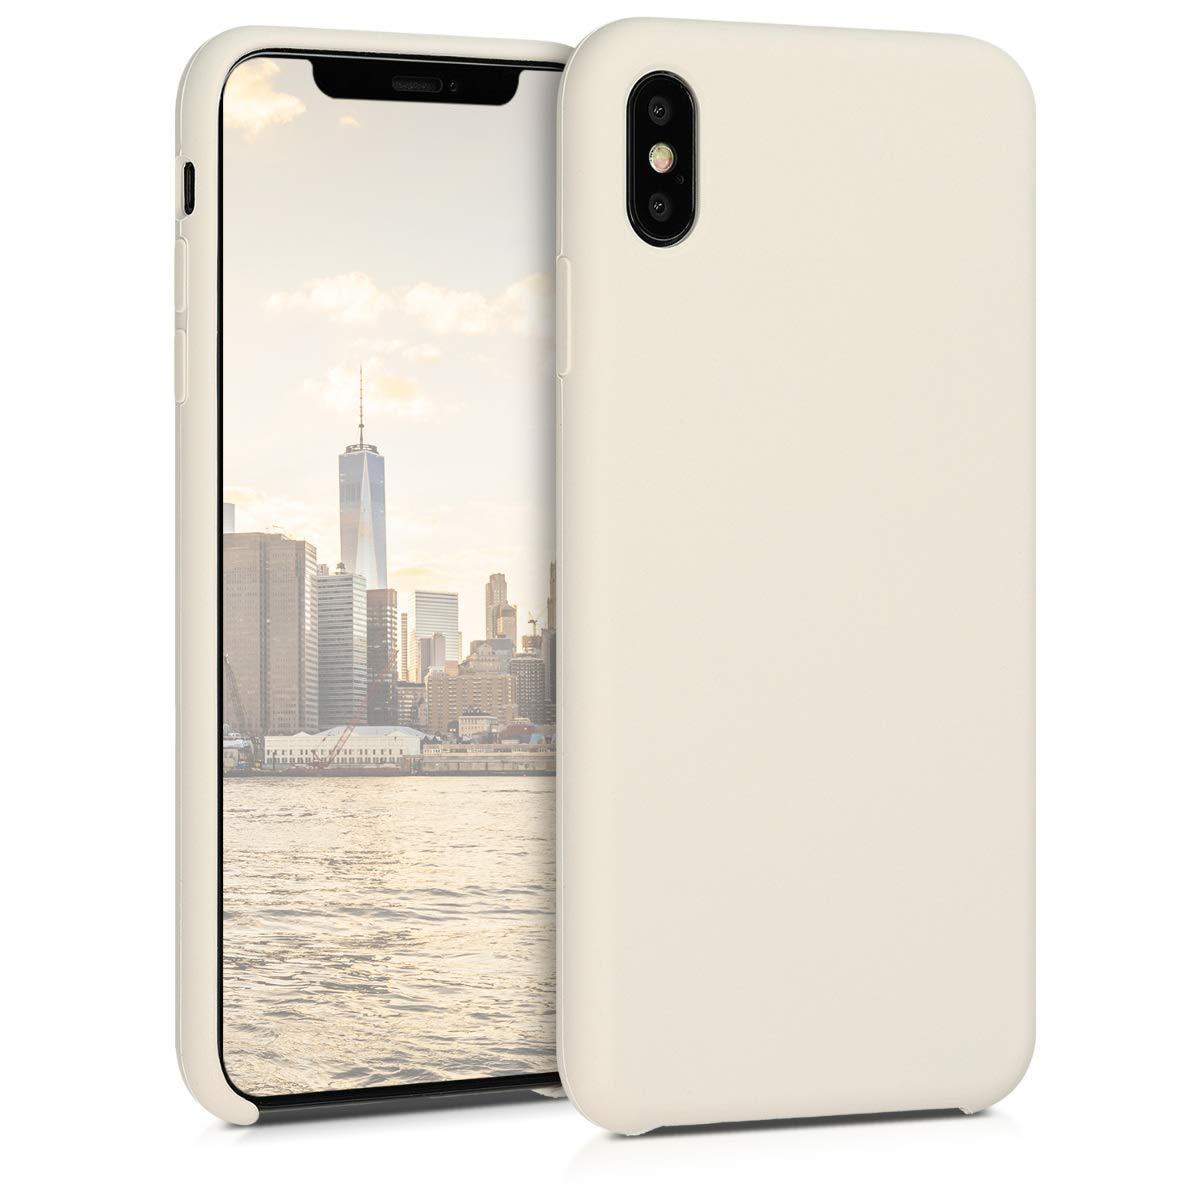 Funda para Iphone Xs Max KWMOBILE (7L5GWV15)